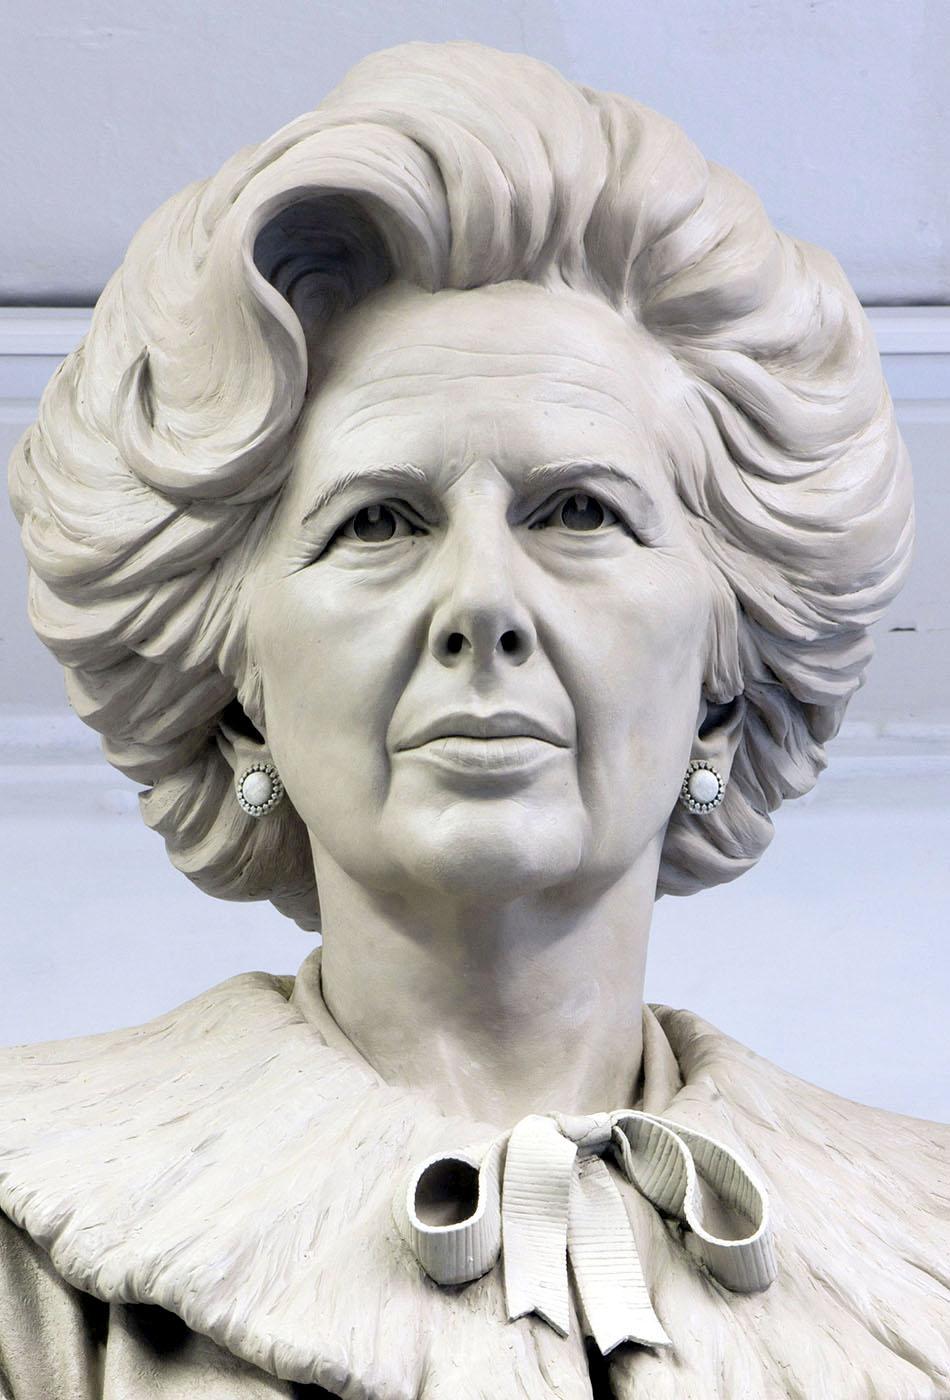 Portrait sculptor Baroness Thatcher